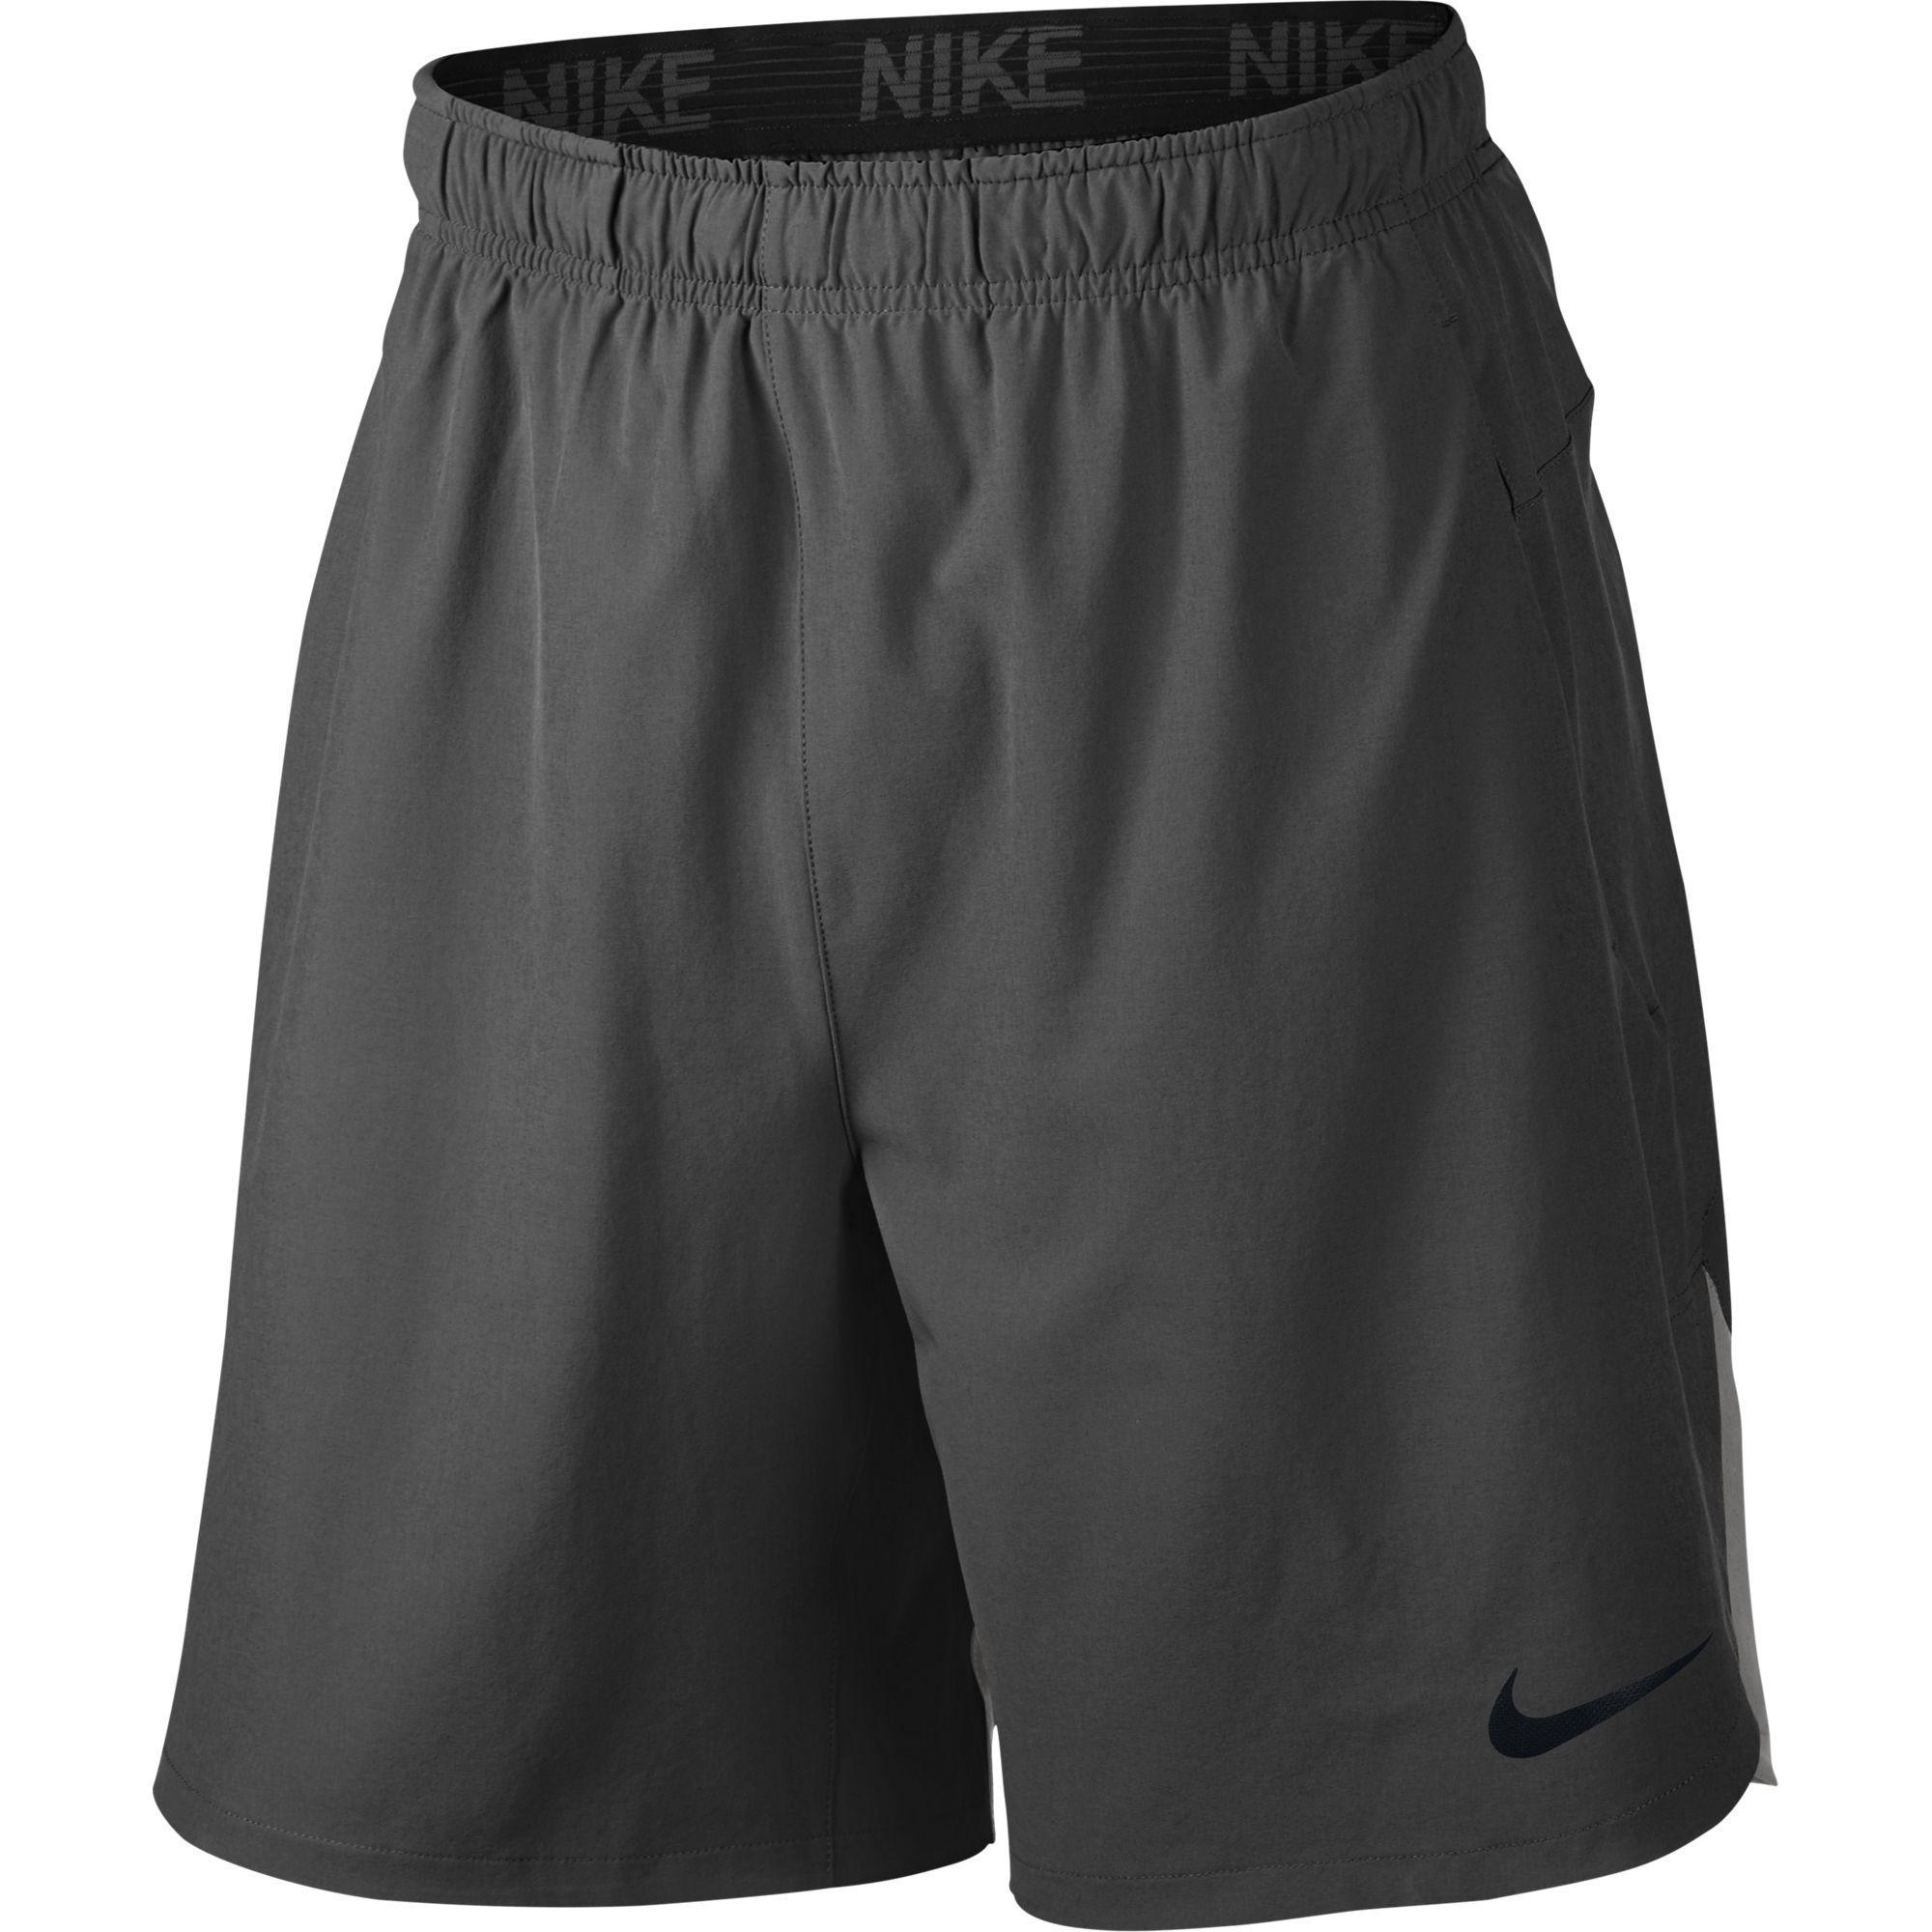 783039fcac5 Nike Mens Flex Training Short - Mightnight Fog Dust Black - Tennisnuts.com